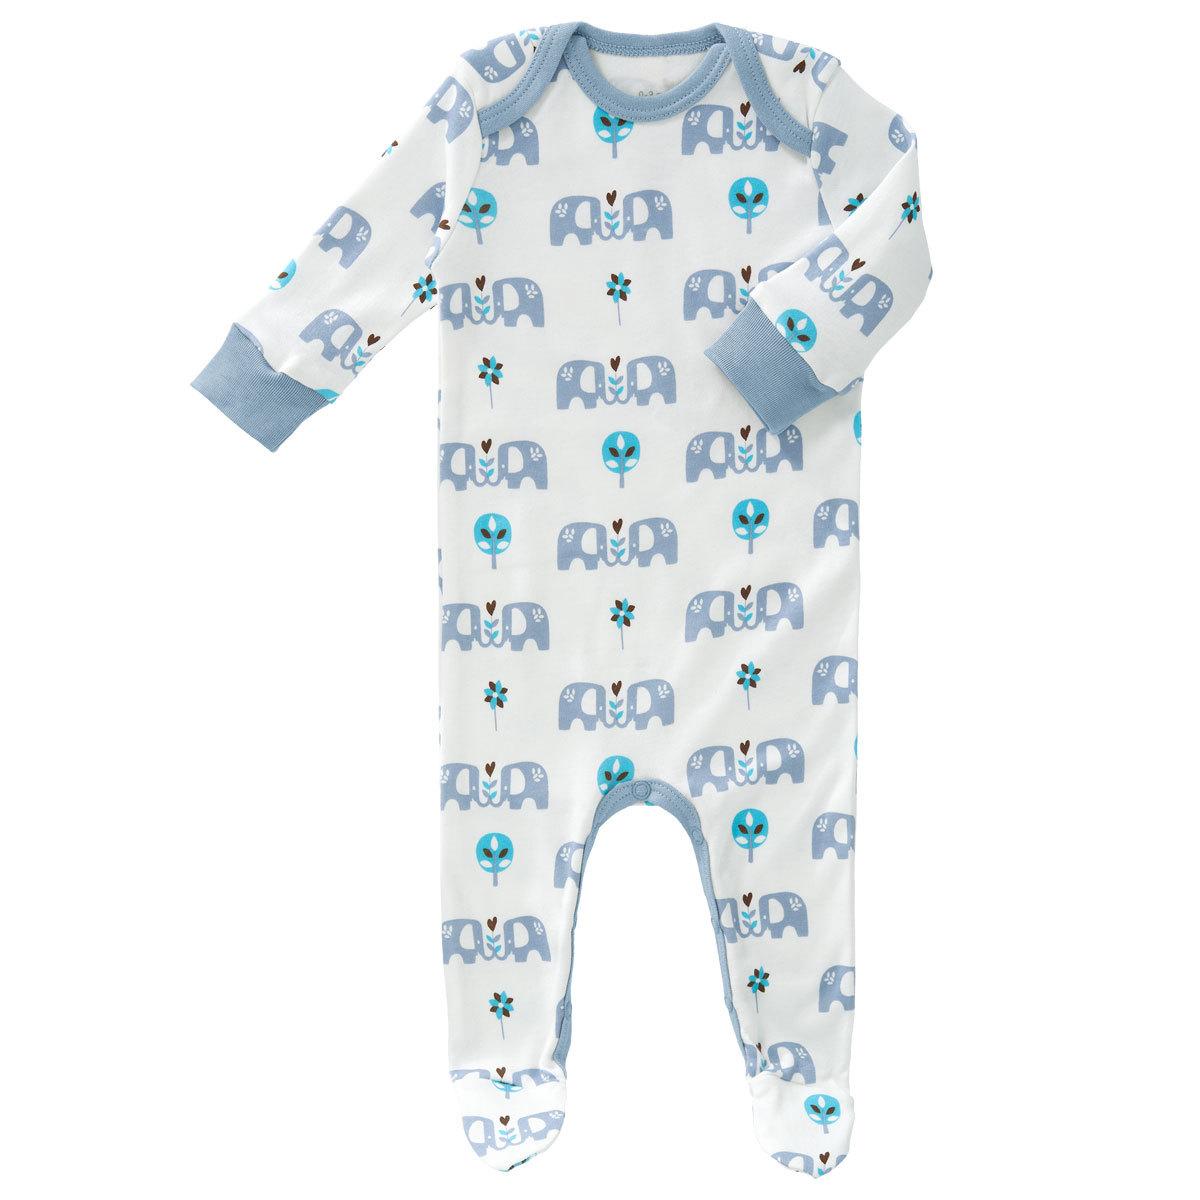 Pyjama avec pied el phant bleu 6 12 mois ff138 12 - Pyjama elephant ...